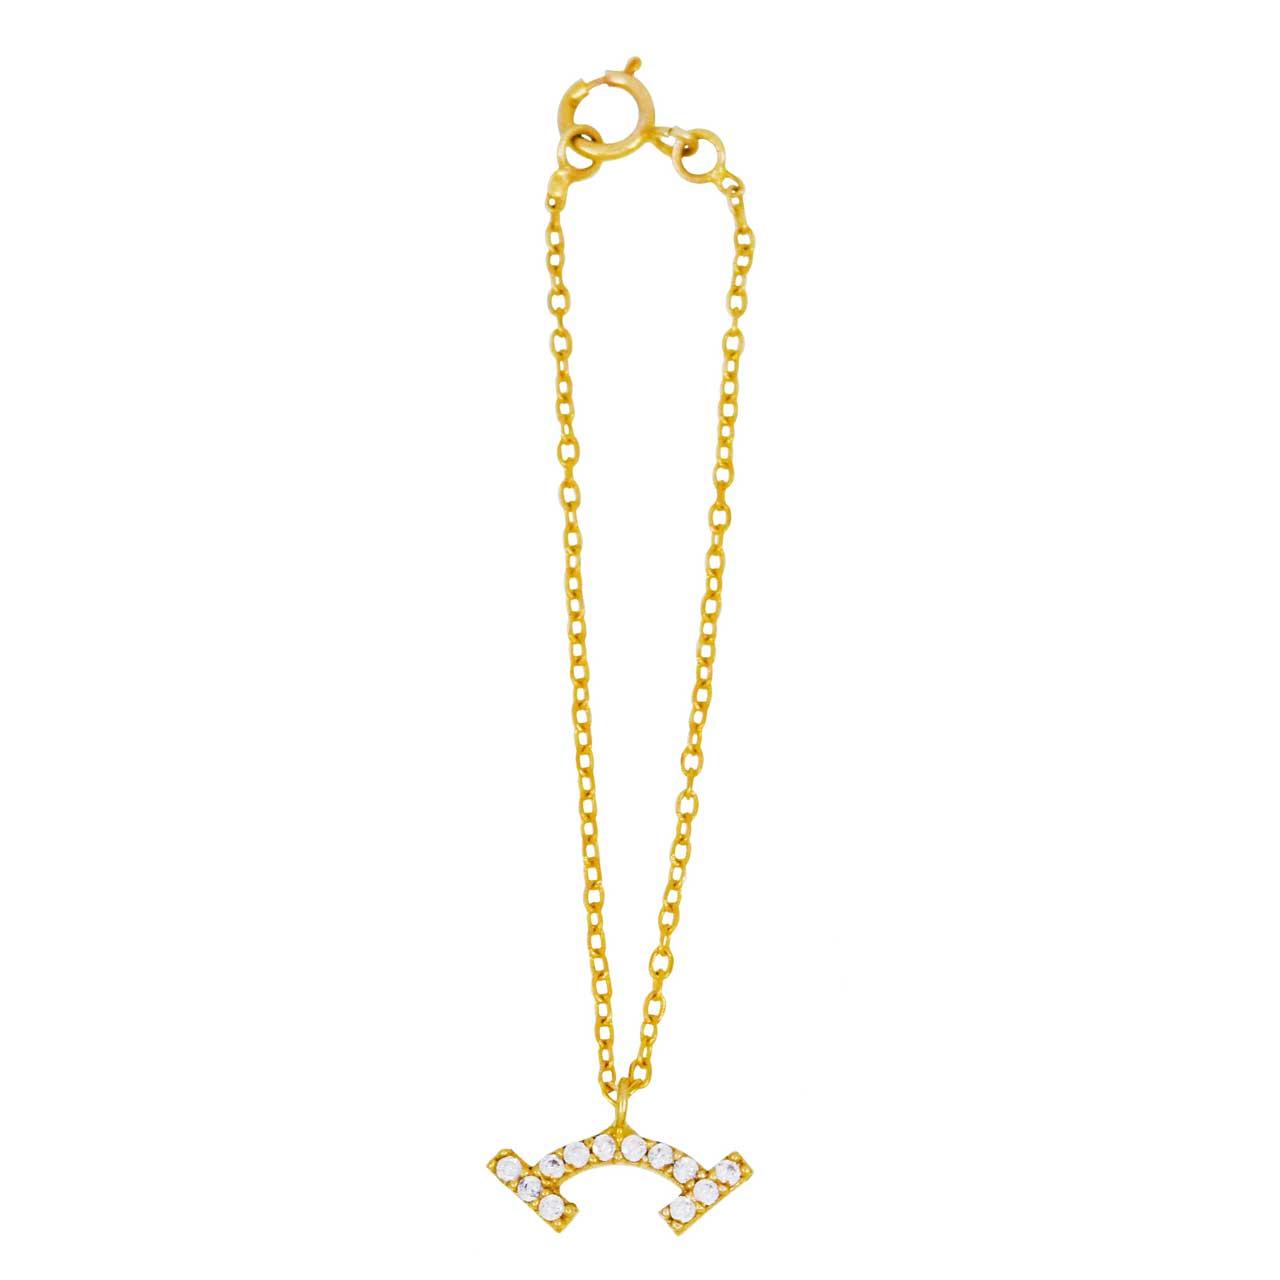 خرید آویز ساعت طلا 18 عیار کانیار گالری مدل AS24